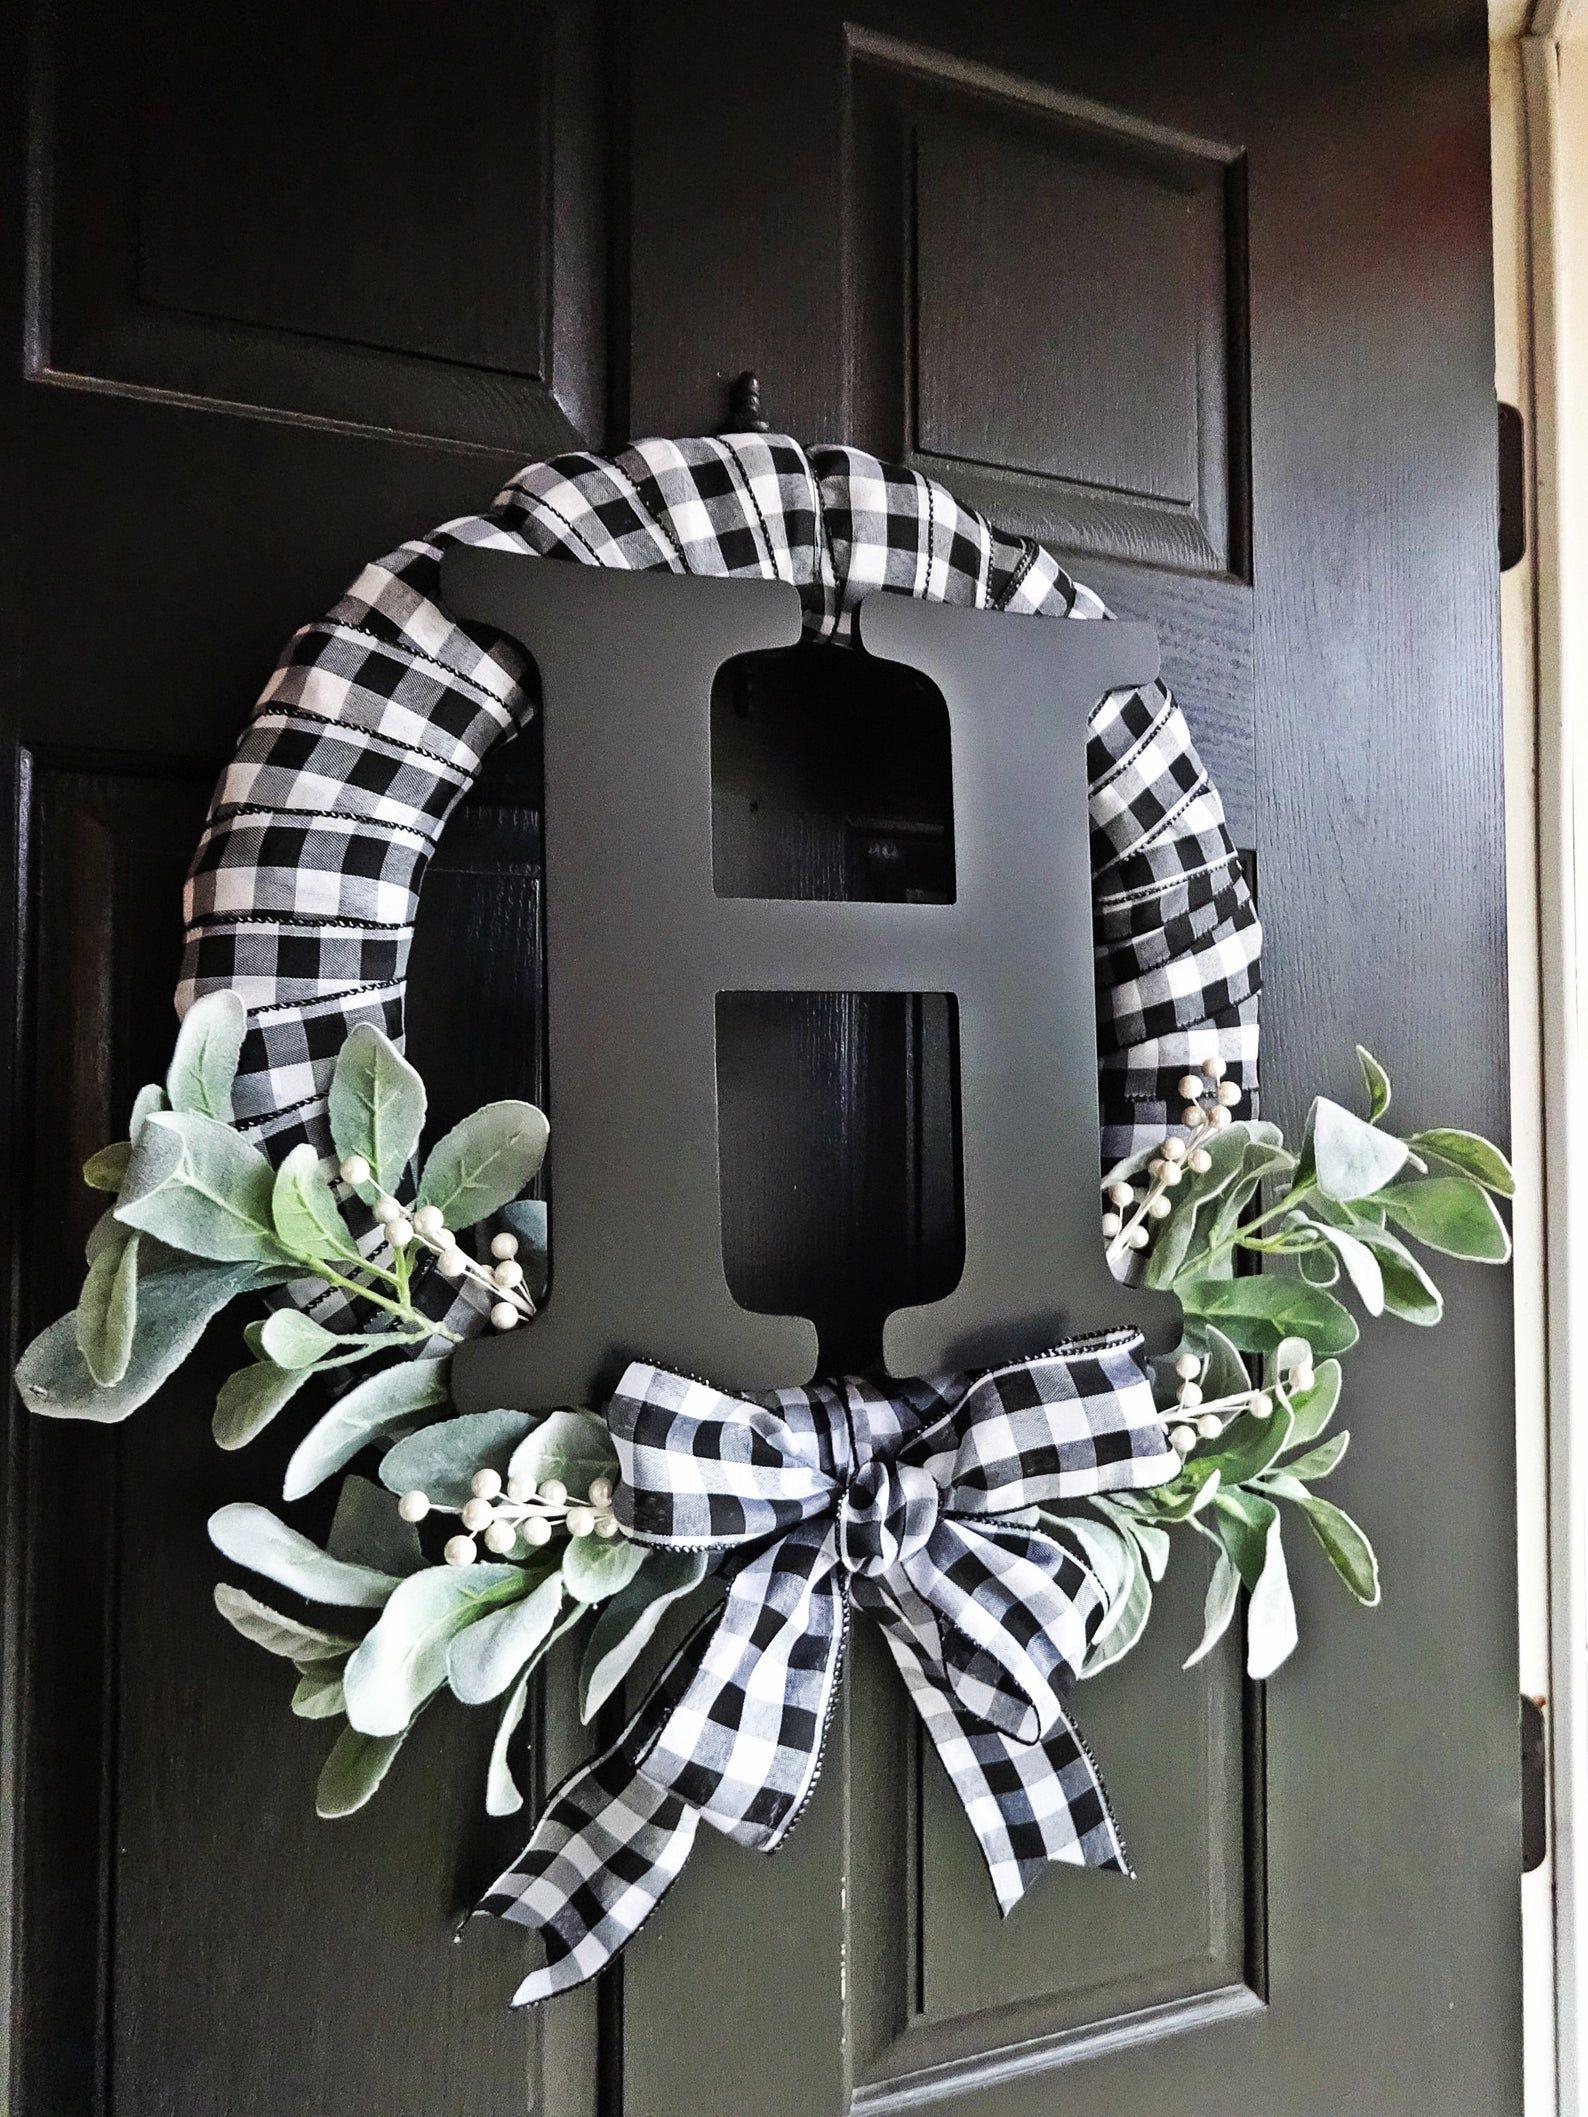 Photo of Buffalo Plaid Wreath, White and Black Wreath, Lambs Ear Wreath, Monogram, Winter Wreath, Everyday Wreath, Buffalo Check, Spring Wreath